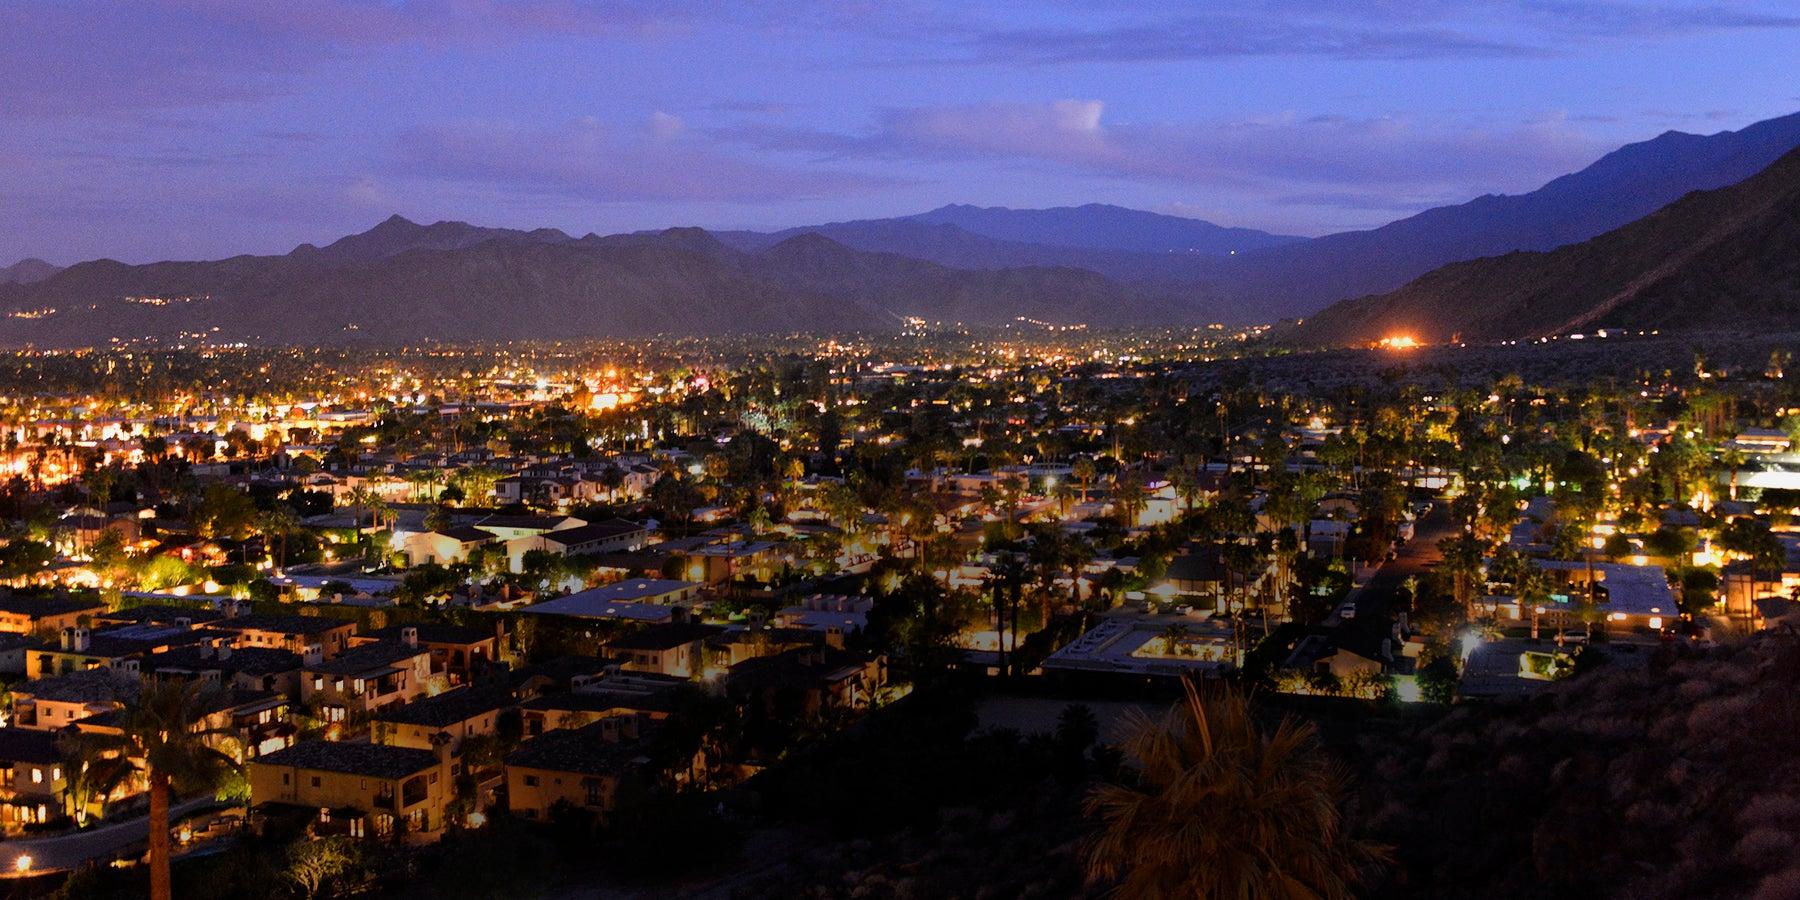 Modernsim Week Palm Springs Celebrating 20th Century Design